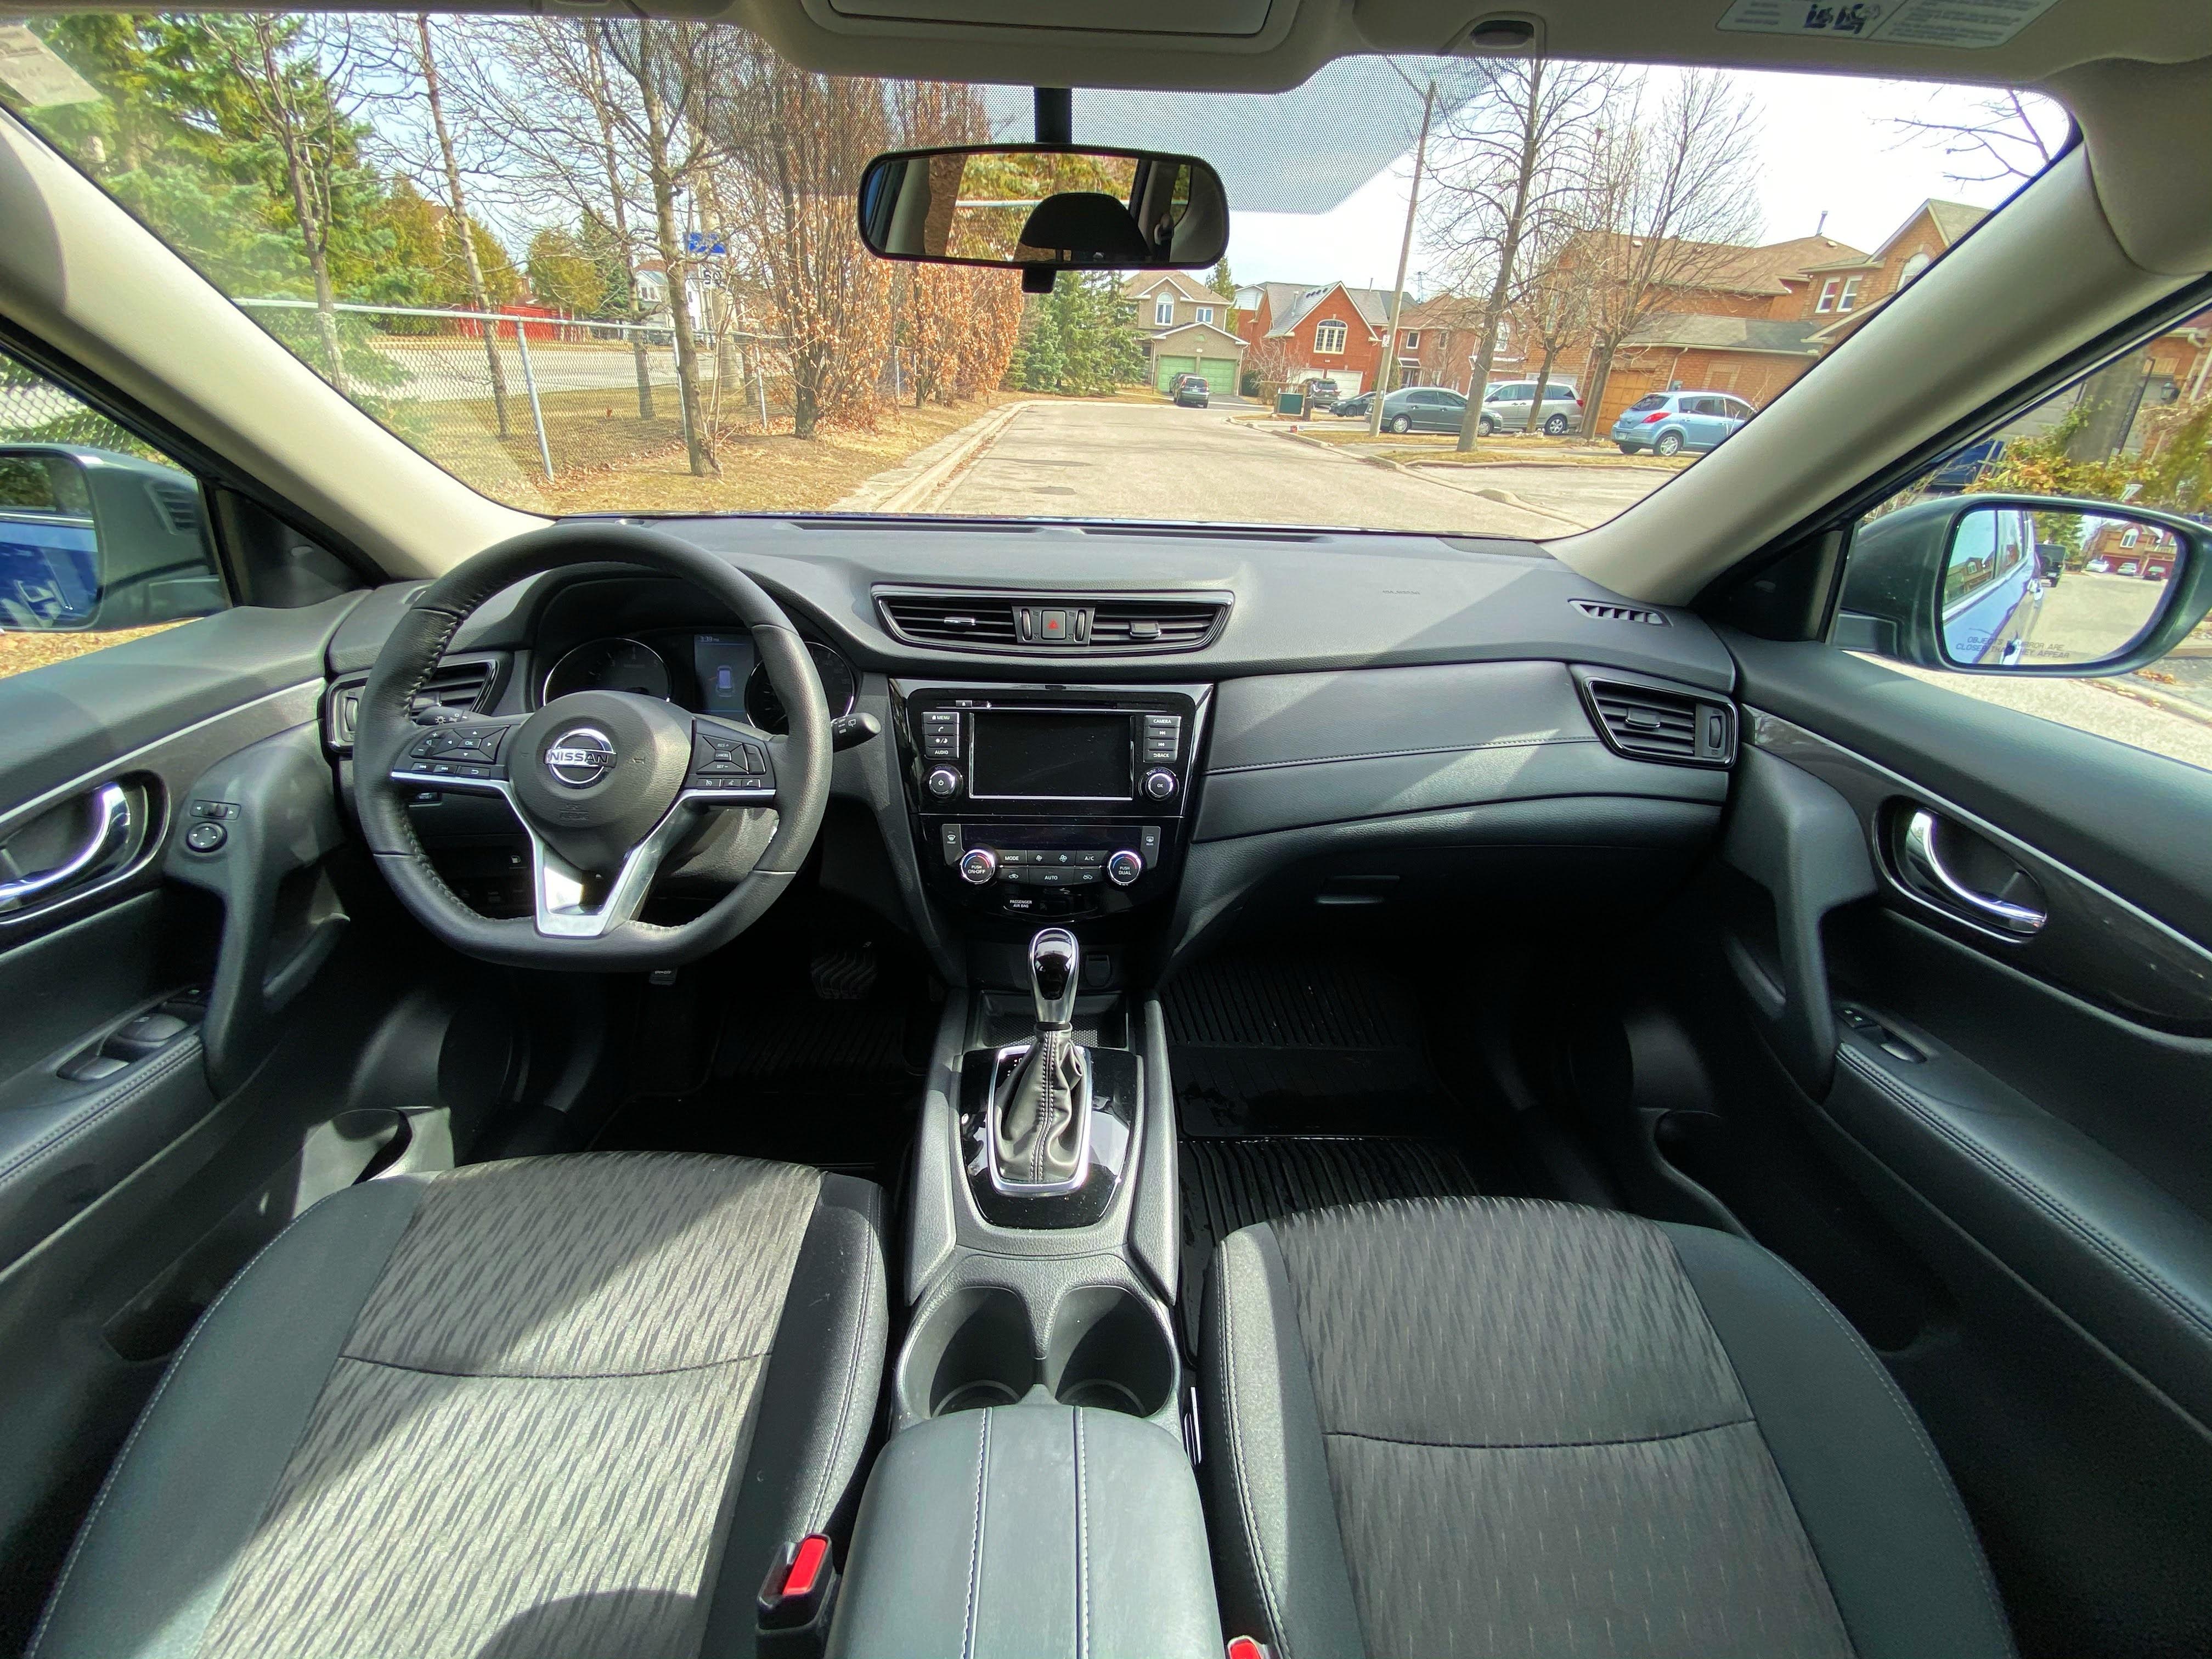 2020 Nissan Rogue SE full